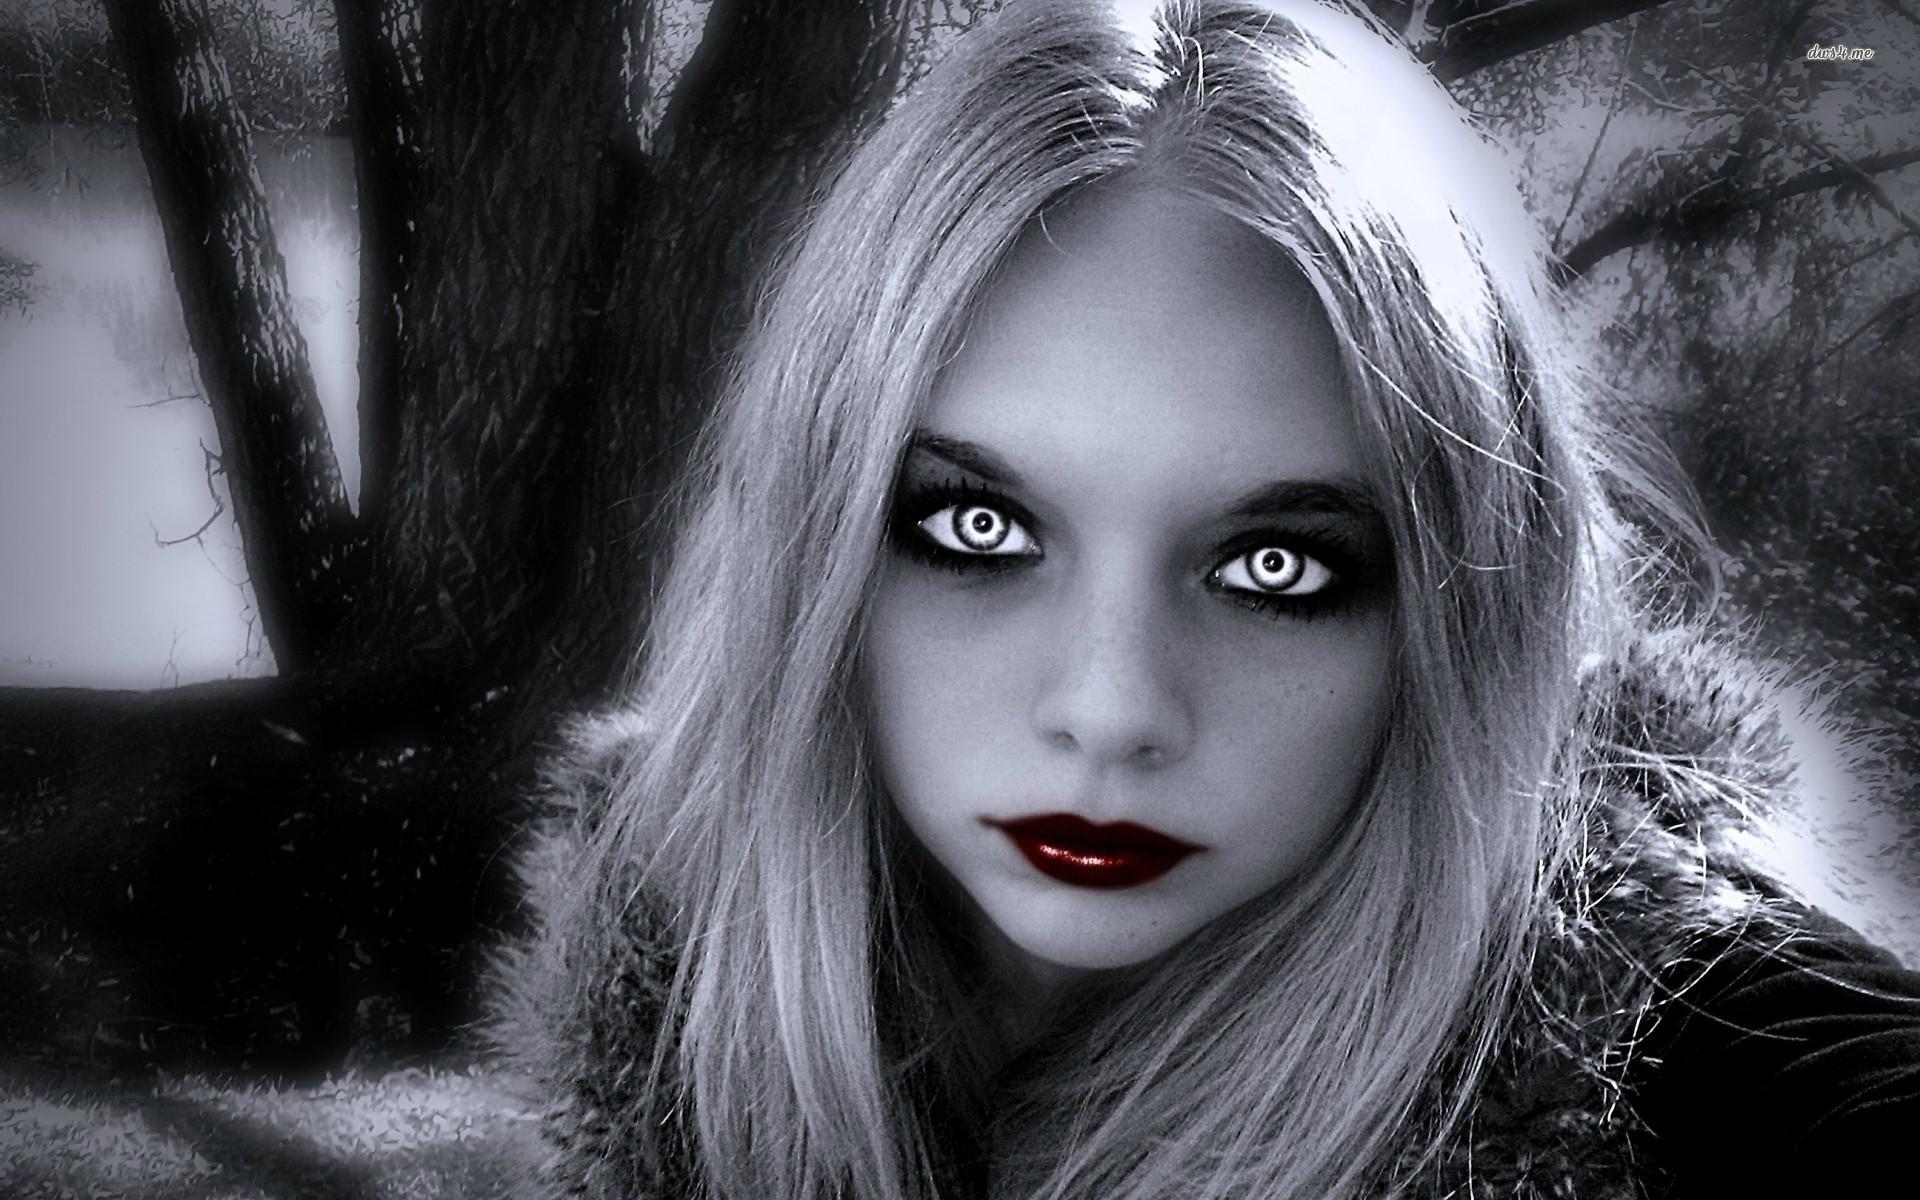 Res: 1920x1200, Goth-girl-free-desktop-girls-wallpaper-1920x1080.jpg